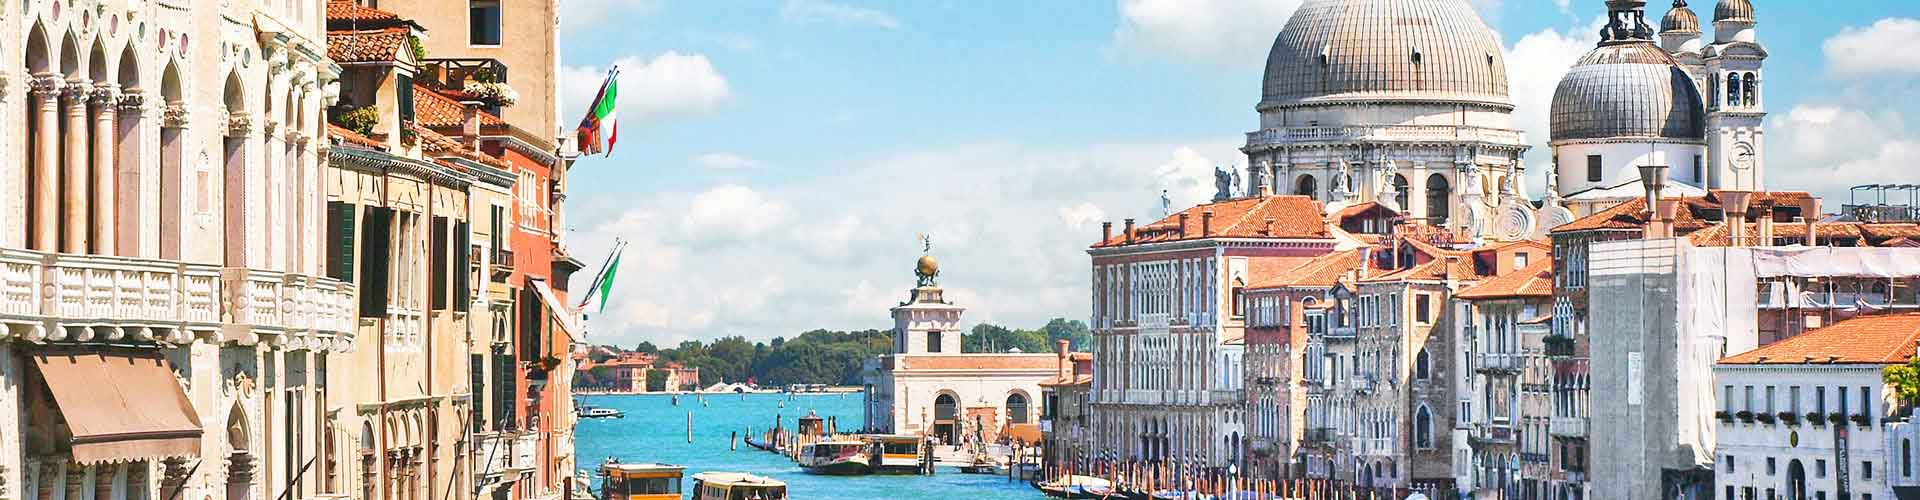 Veneza – Albergues em Veneza. Mapas para Veneza, Fotos e Avaliações para cada Albergue em Veneza.